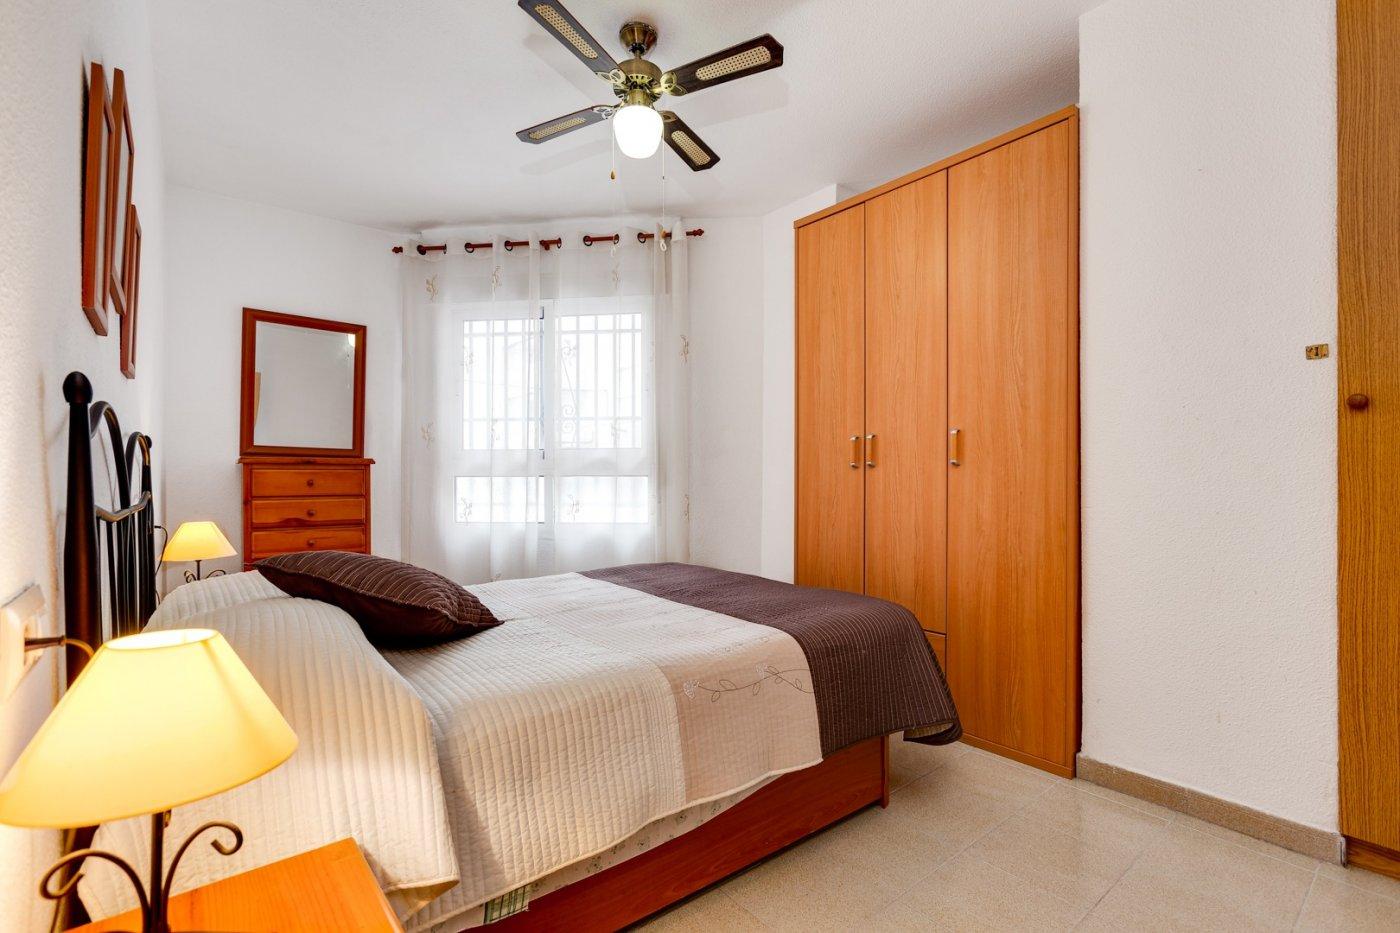 2 BEDROOM APARTMENT 400 METERS FROM THE BEACH PLAYA DEL CURA IN TORREVIEJA